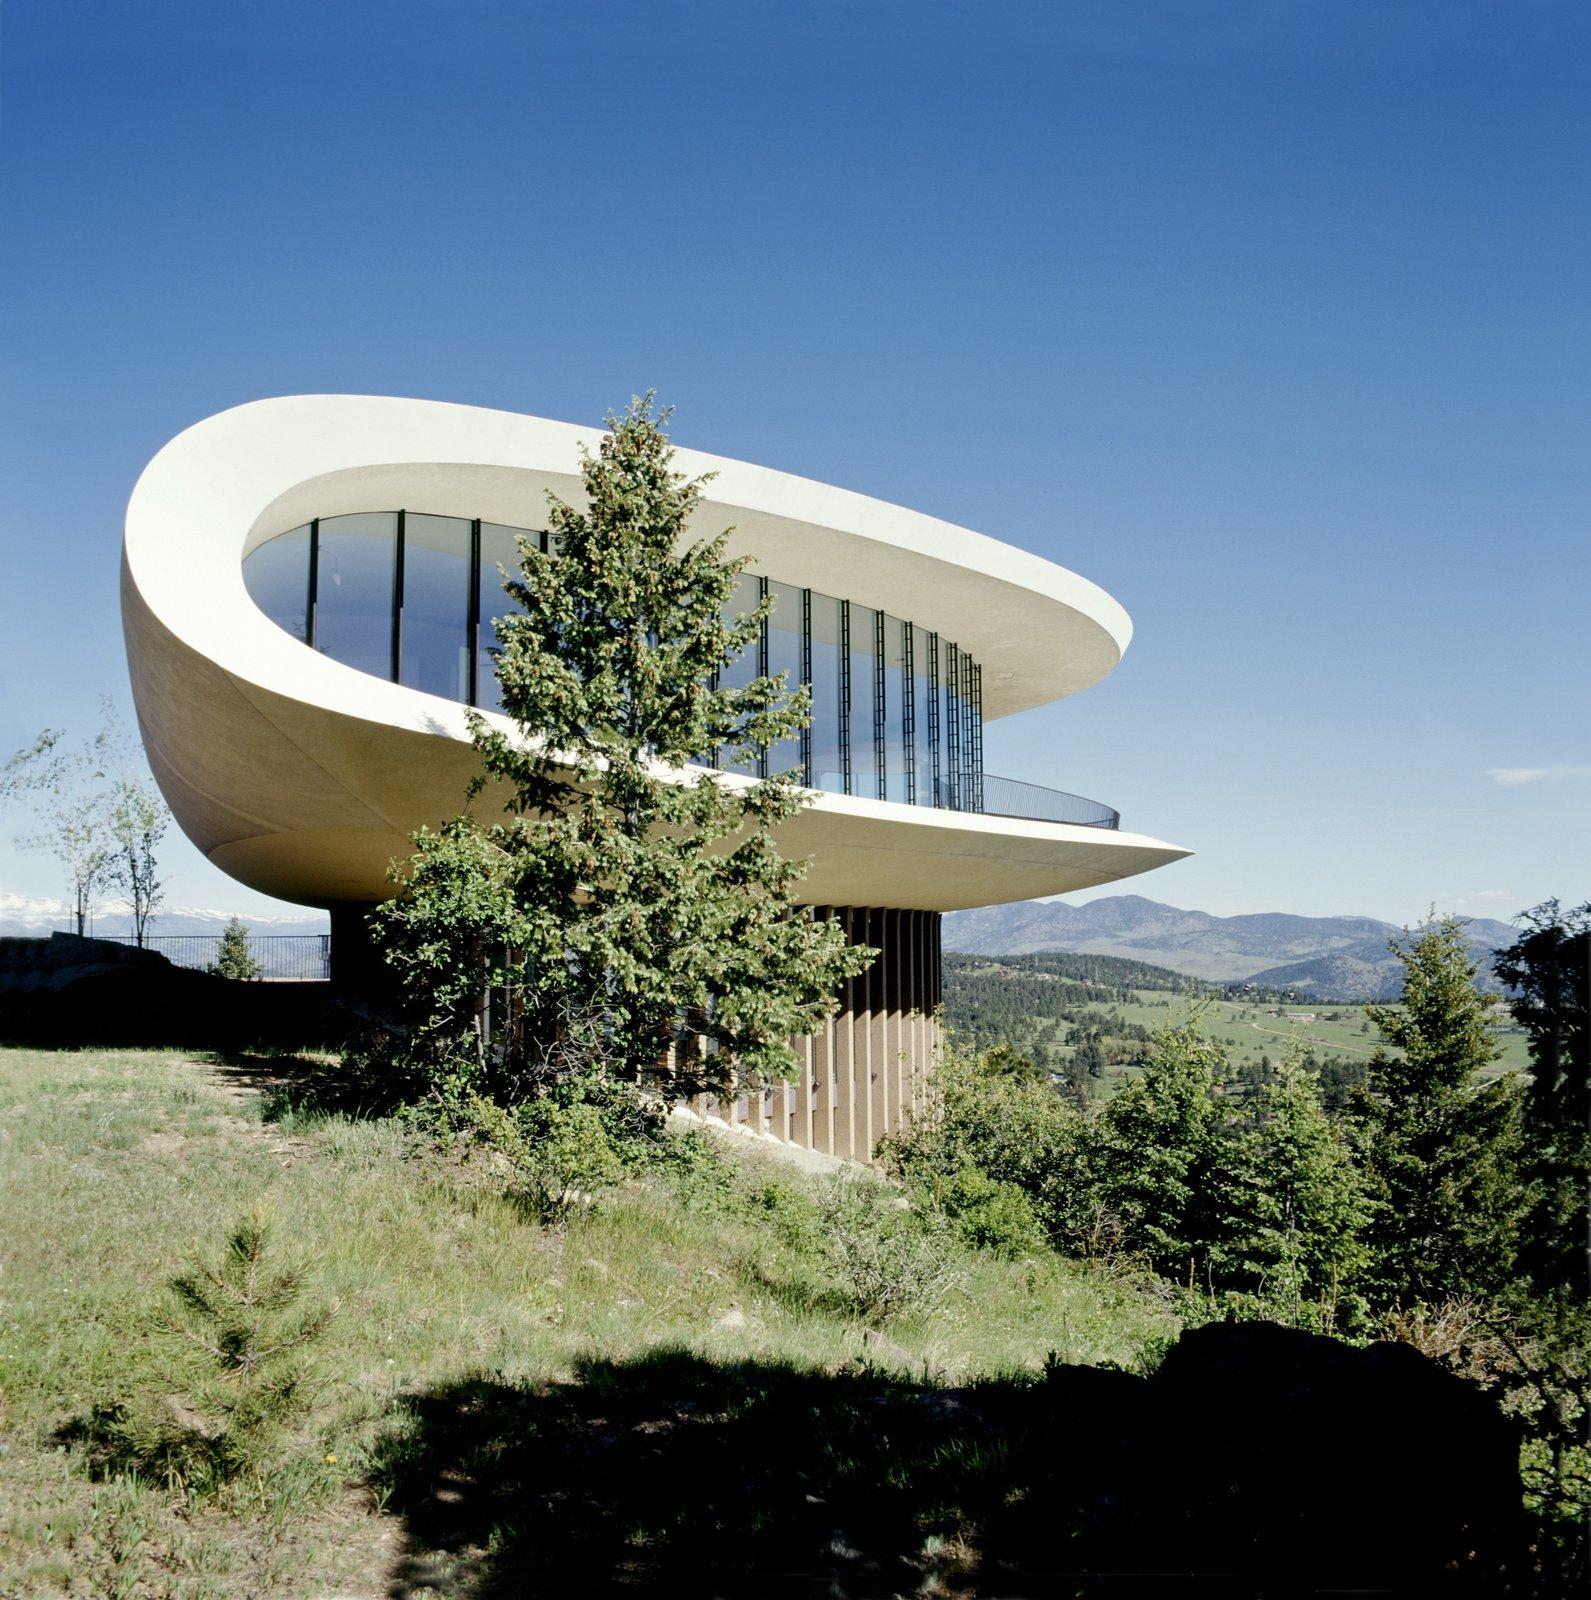 photo 5 of 11 in a new book celebrates modernism with futuristic